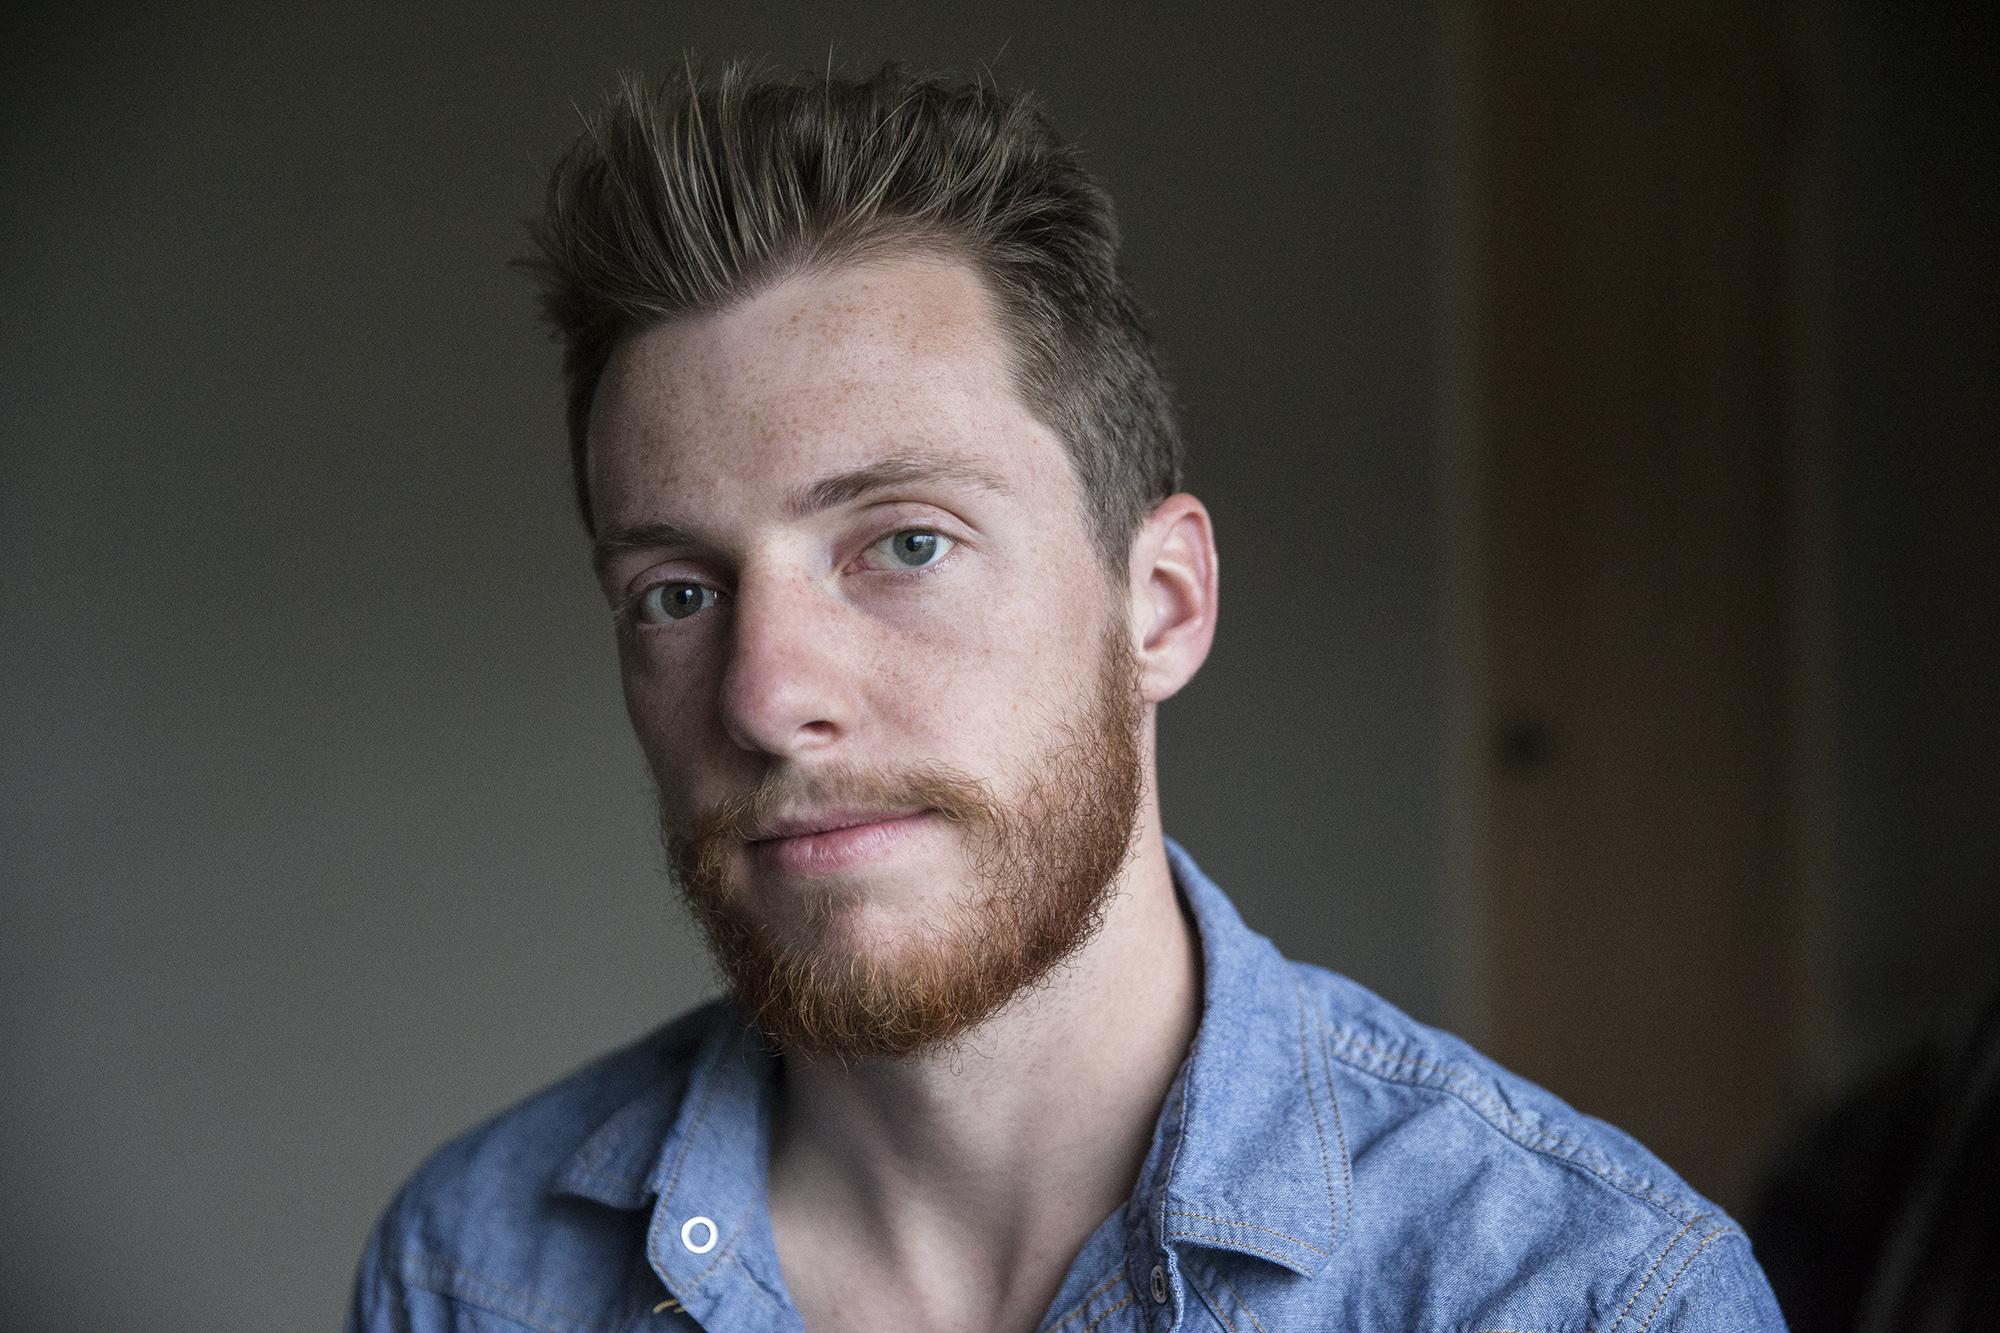 Adam Warner: links to news story